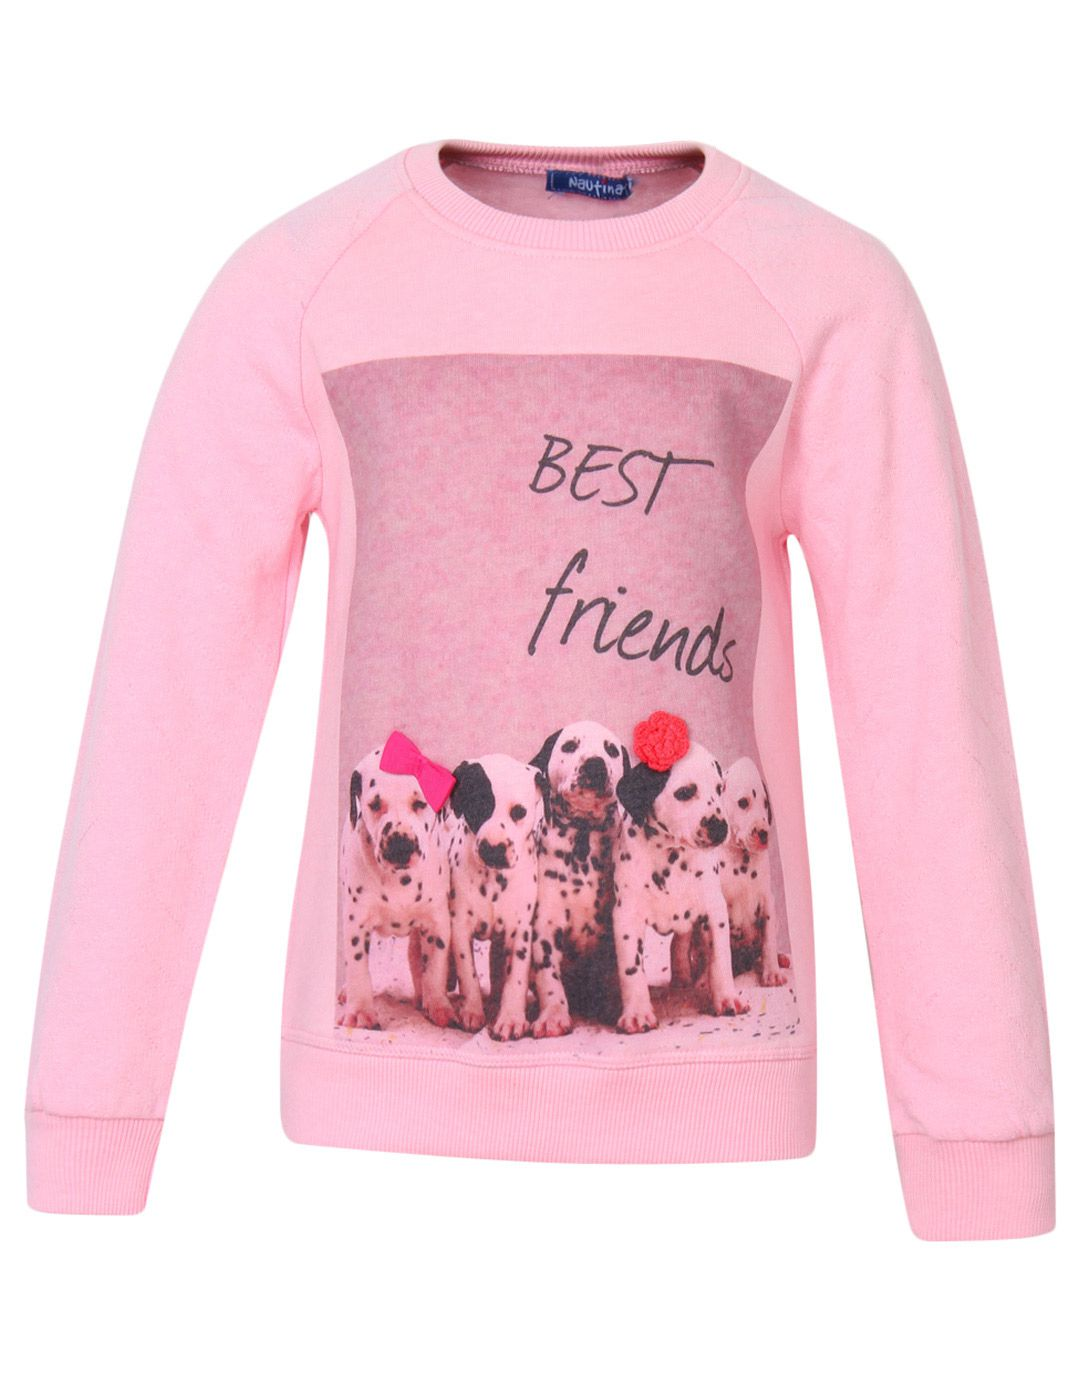 Nauti Nati Pink Cotton Sweatshirt